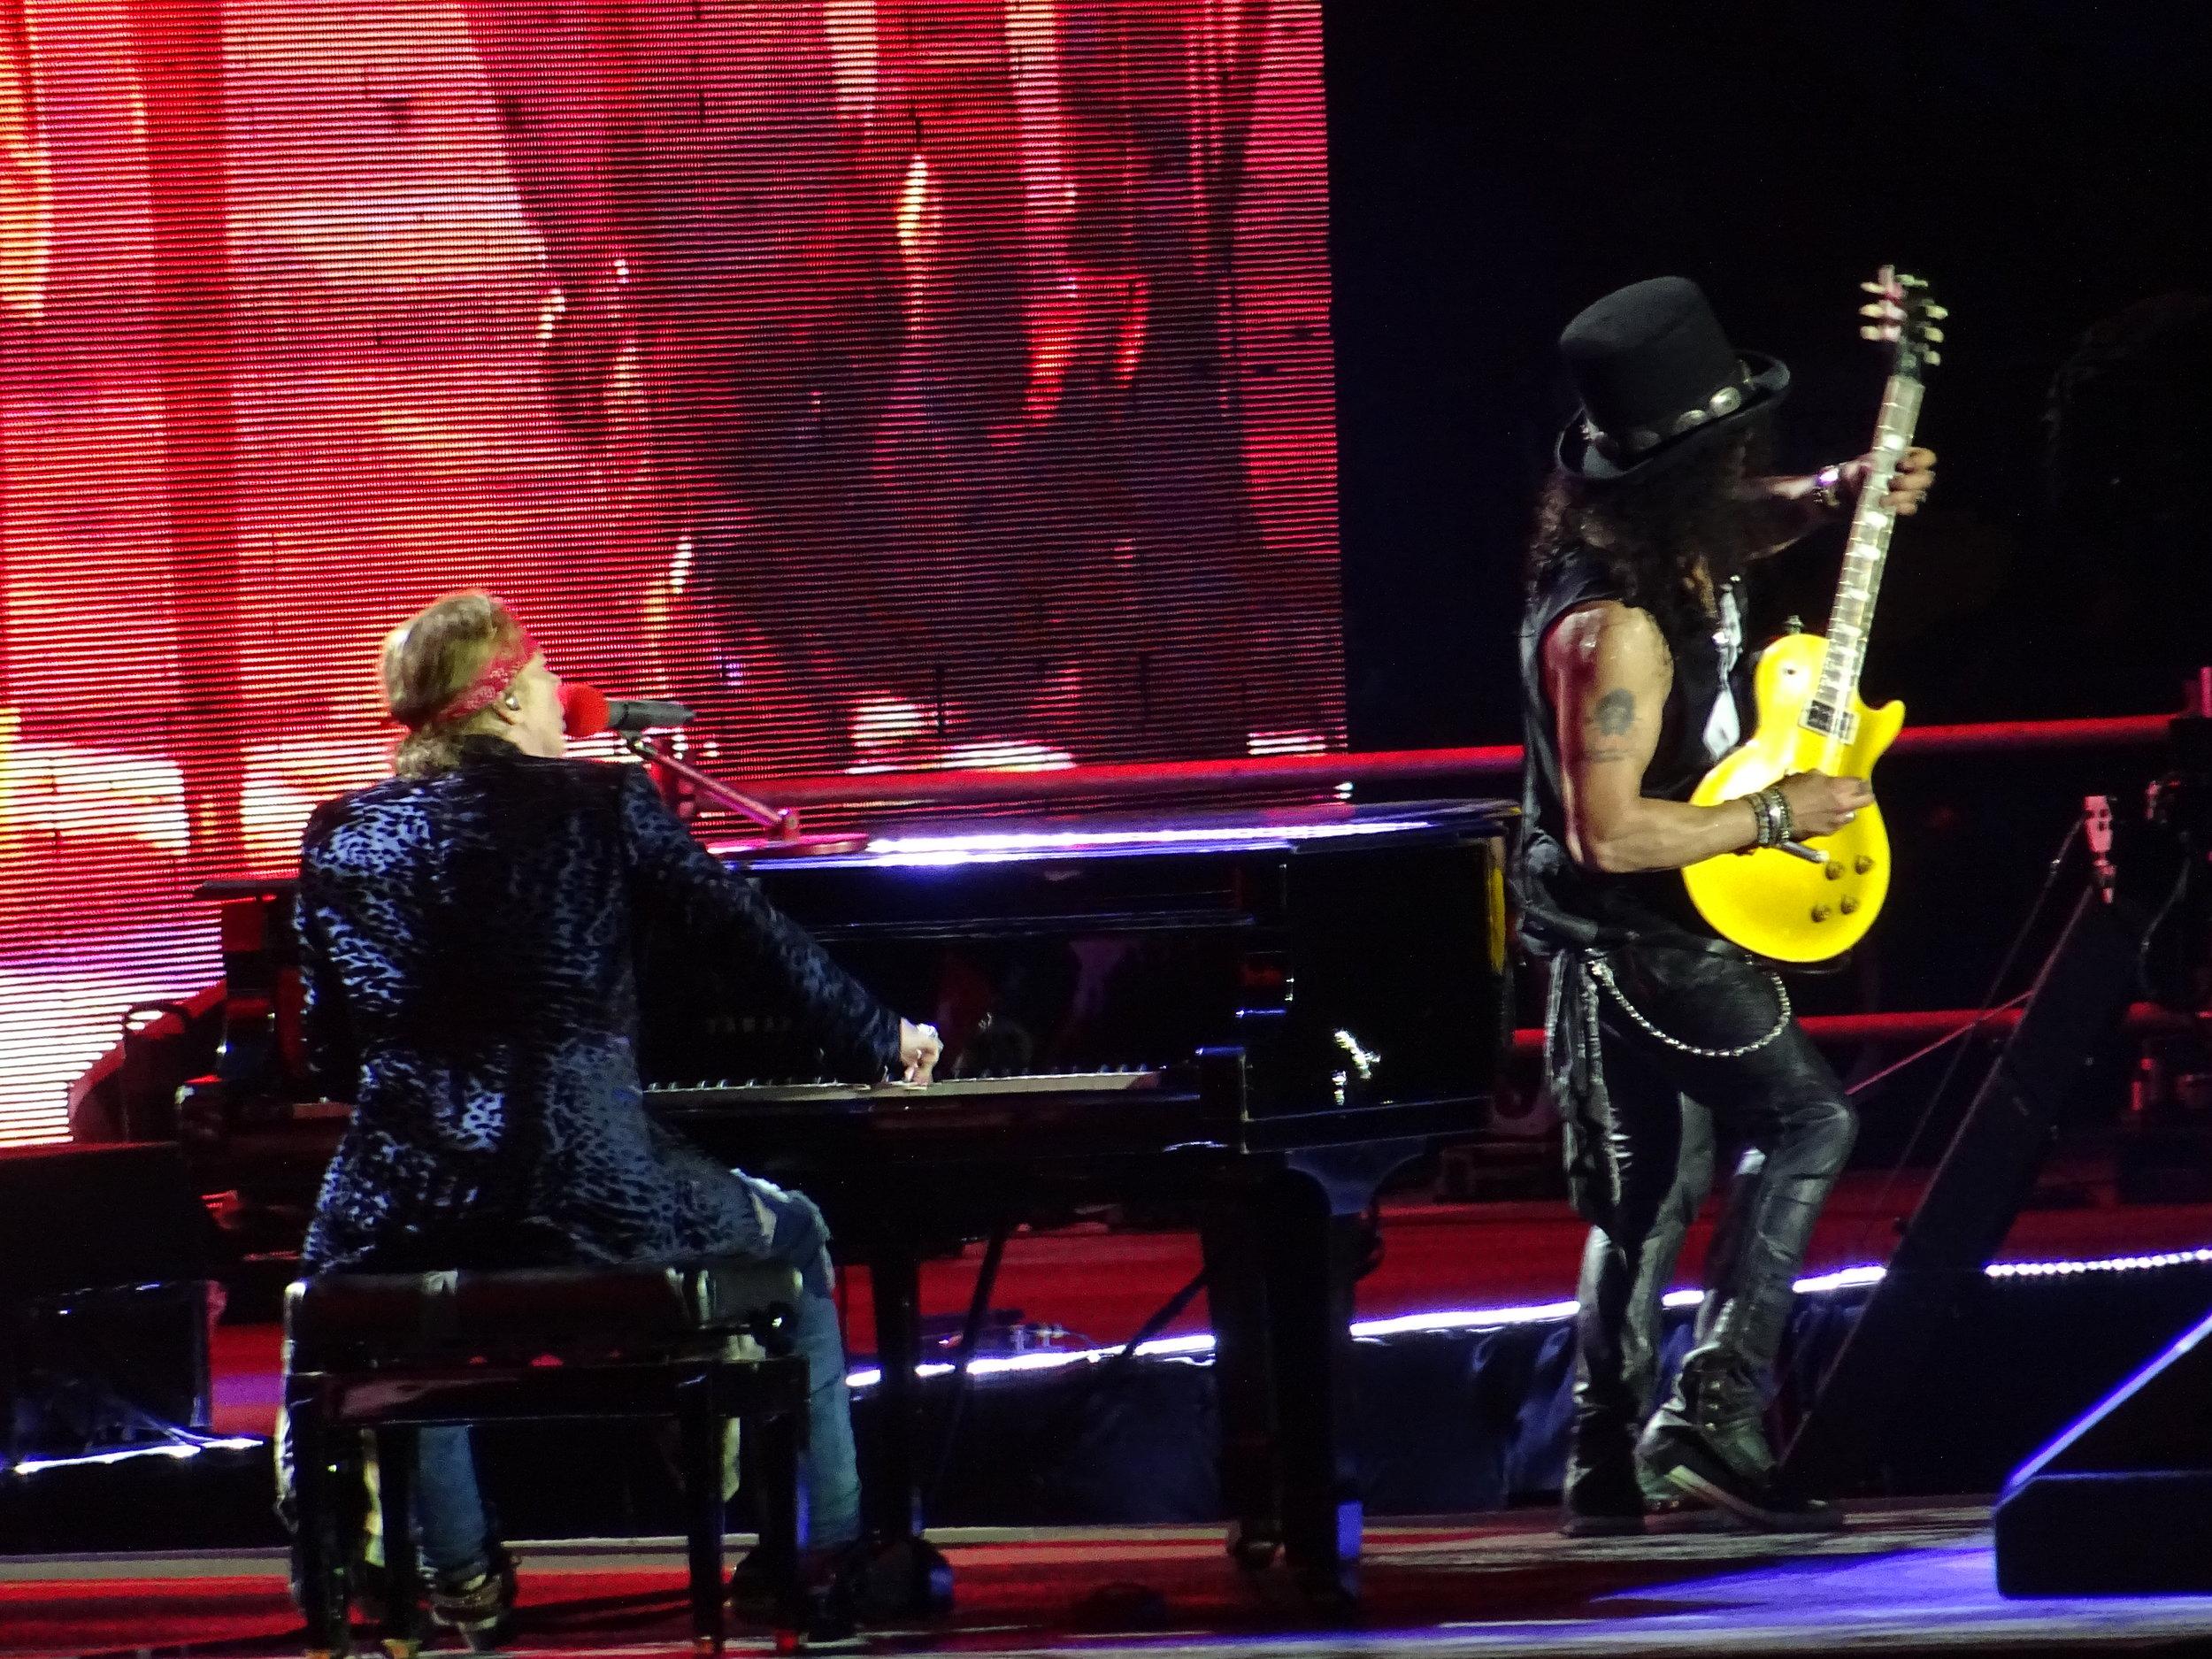 Axl sits down at the piano as Slash shreds the November Rain solo Picture (c) Philip Giouras @ The Perfect Tempo